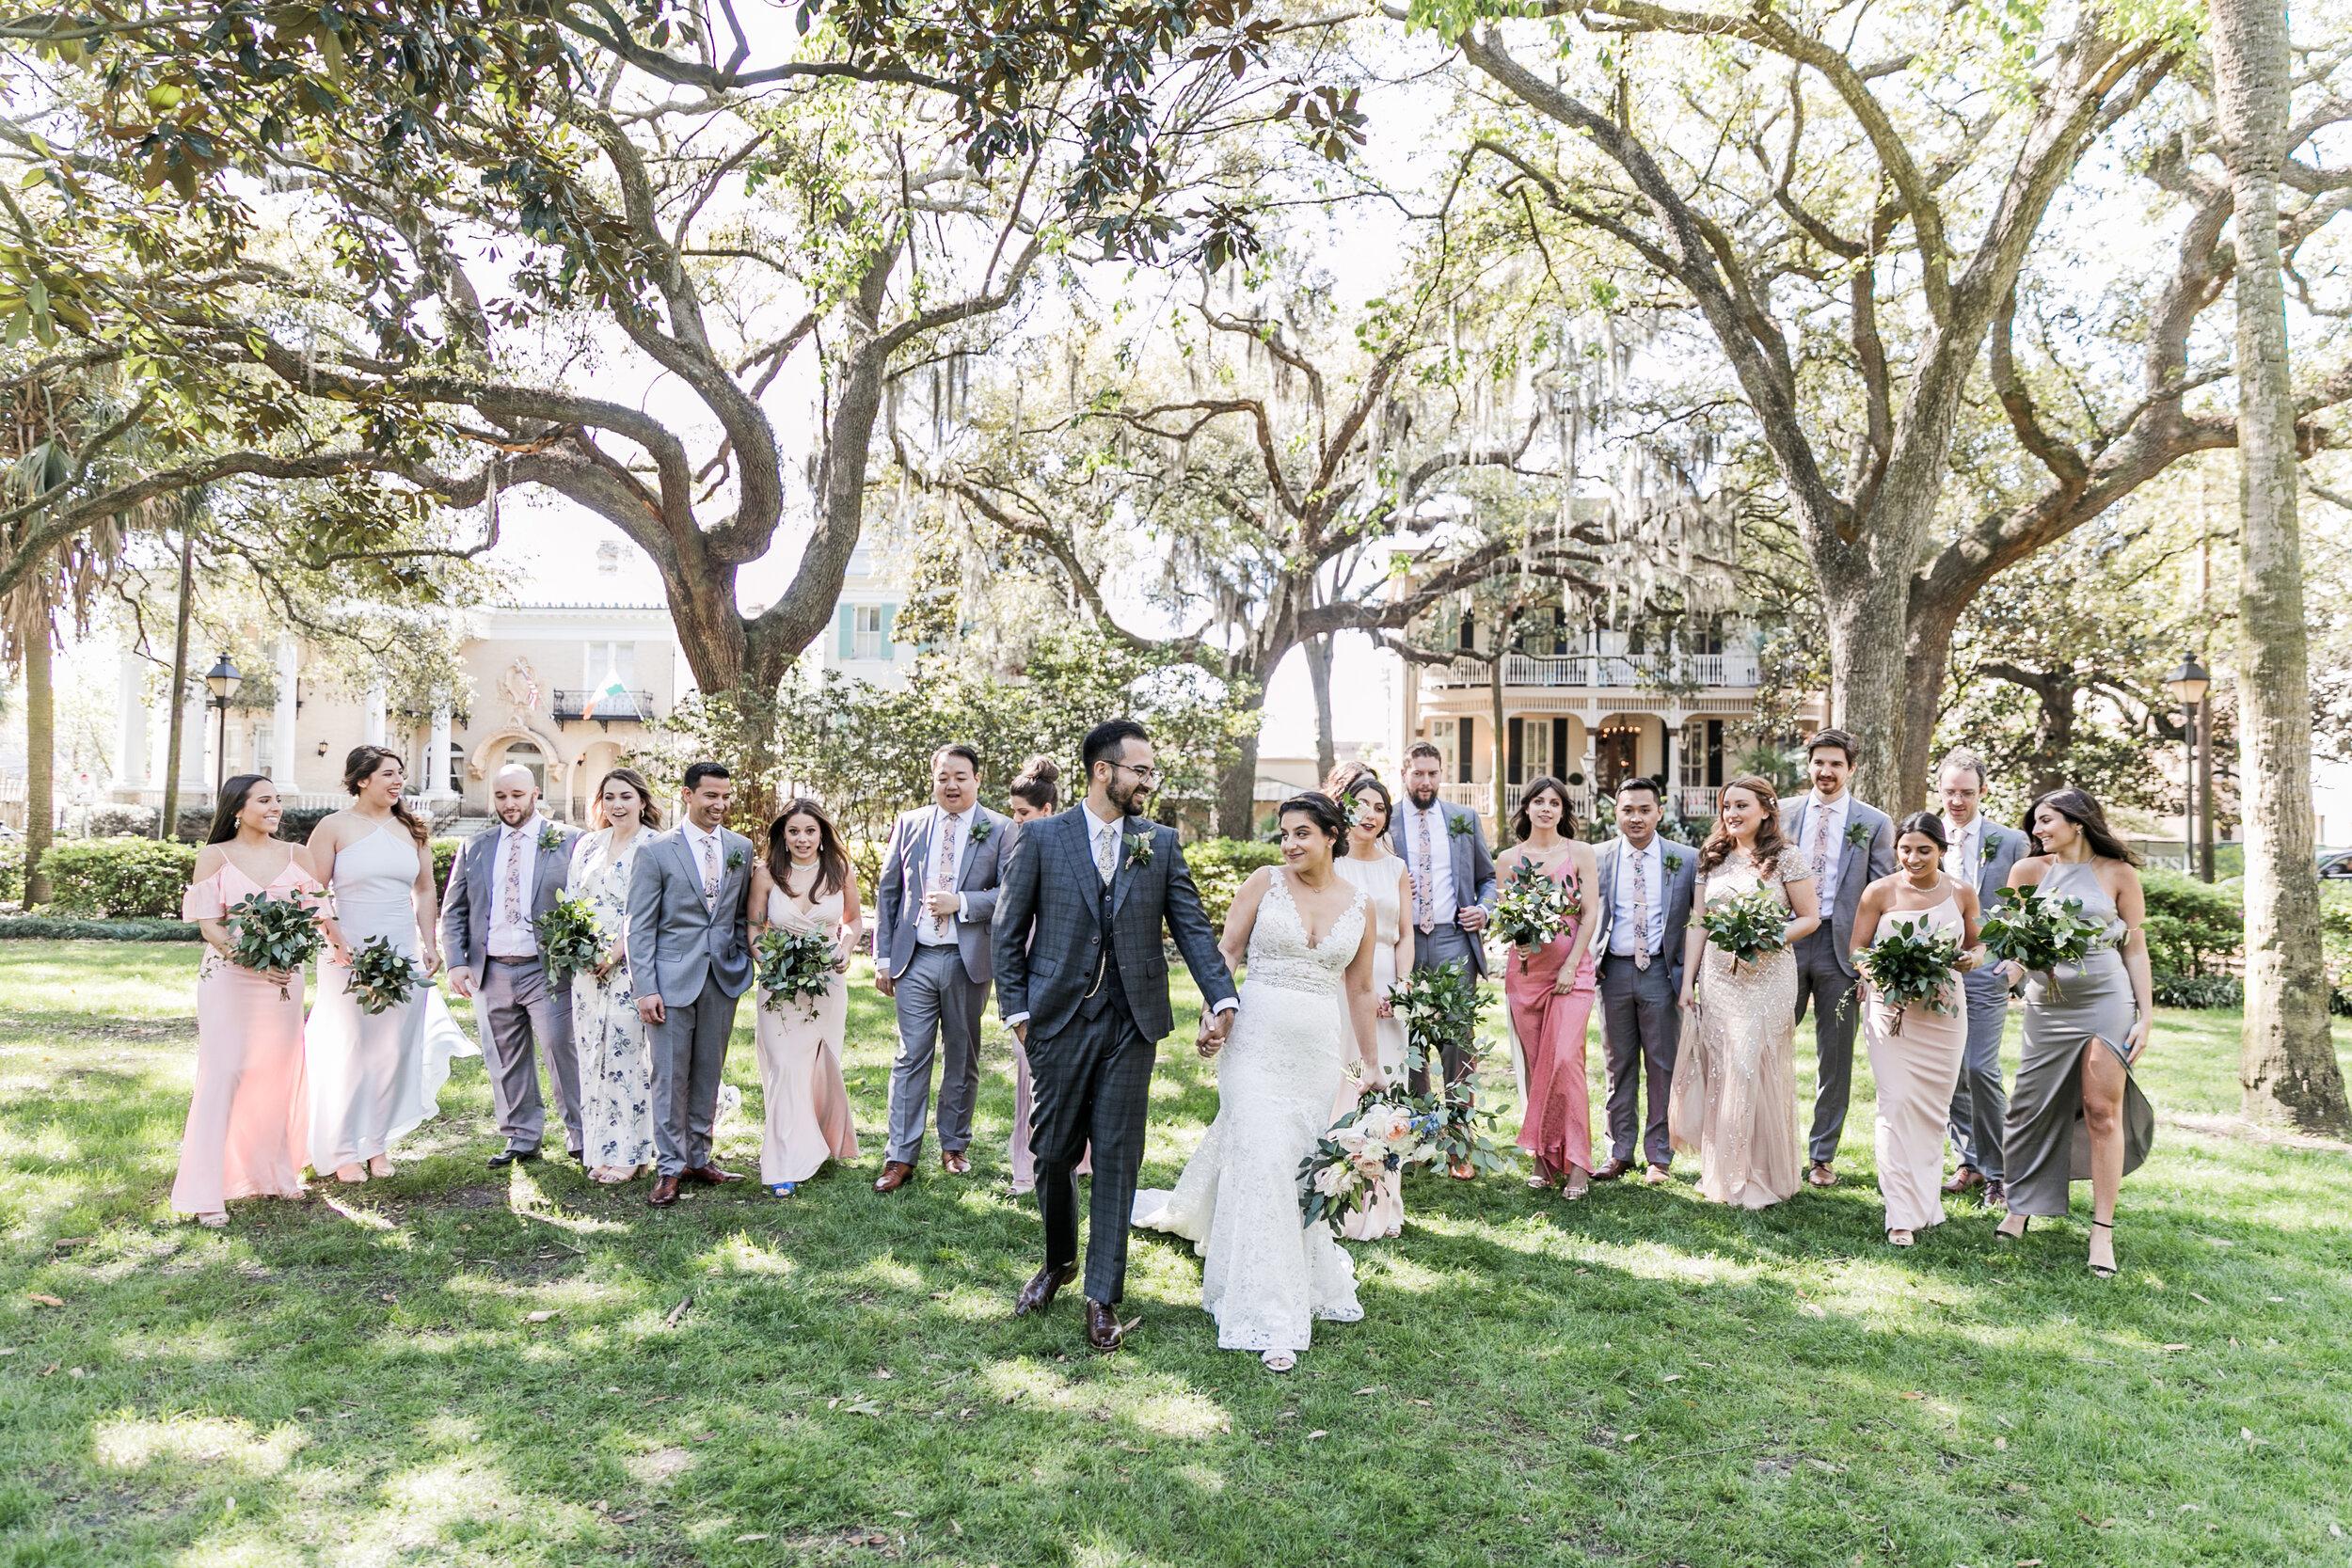 ivory-and-beau-blog-weddings-ivory-and-beau-couple-dominique-and-andres-savannah-florist-wedding-planning-savannah-bridal-boutique-wedding-flowers-KIP_WEBERWEDDING_RAILROADMUSEUM-498.JPG